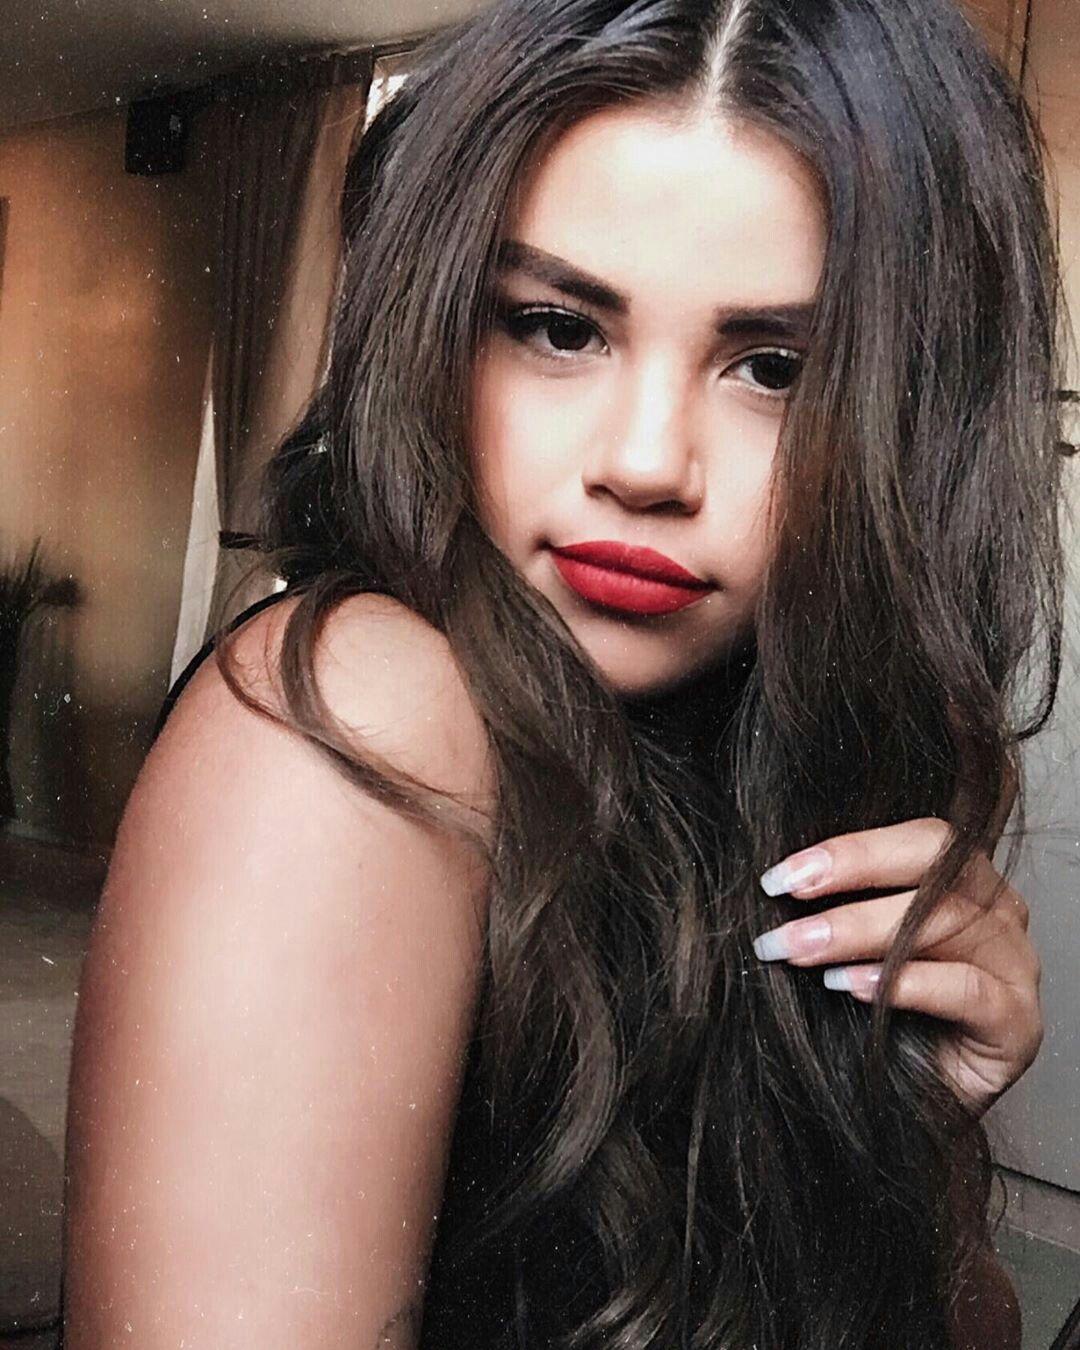 Pin By Samantha Hopper On Sofia Solares Selena Gomez Instagram Selena